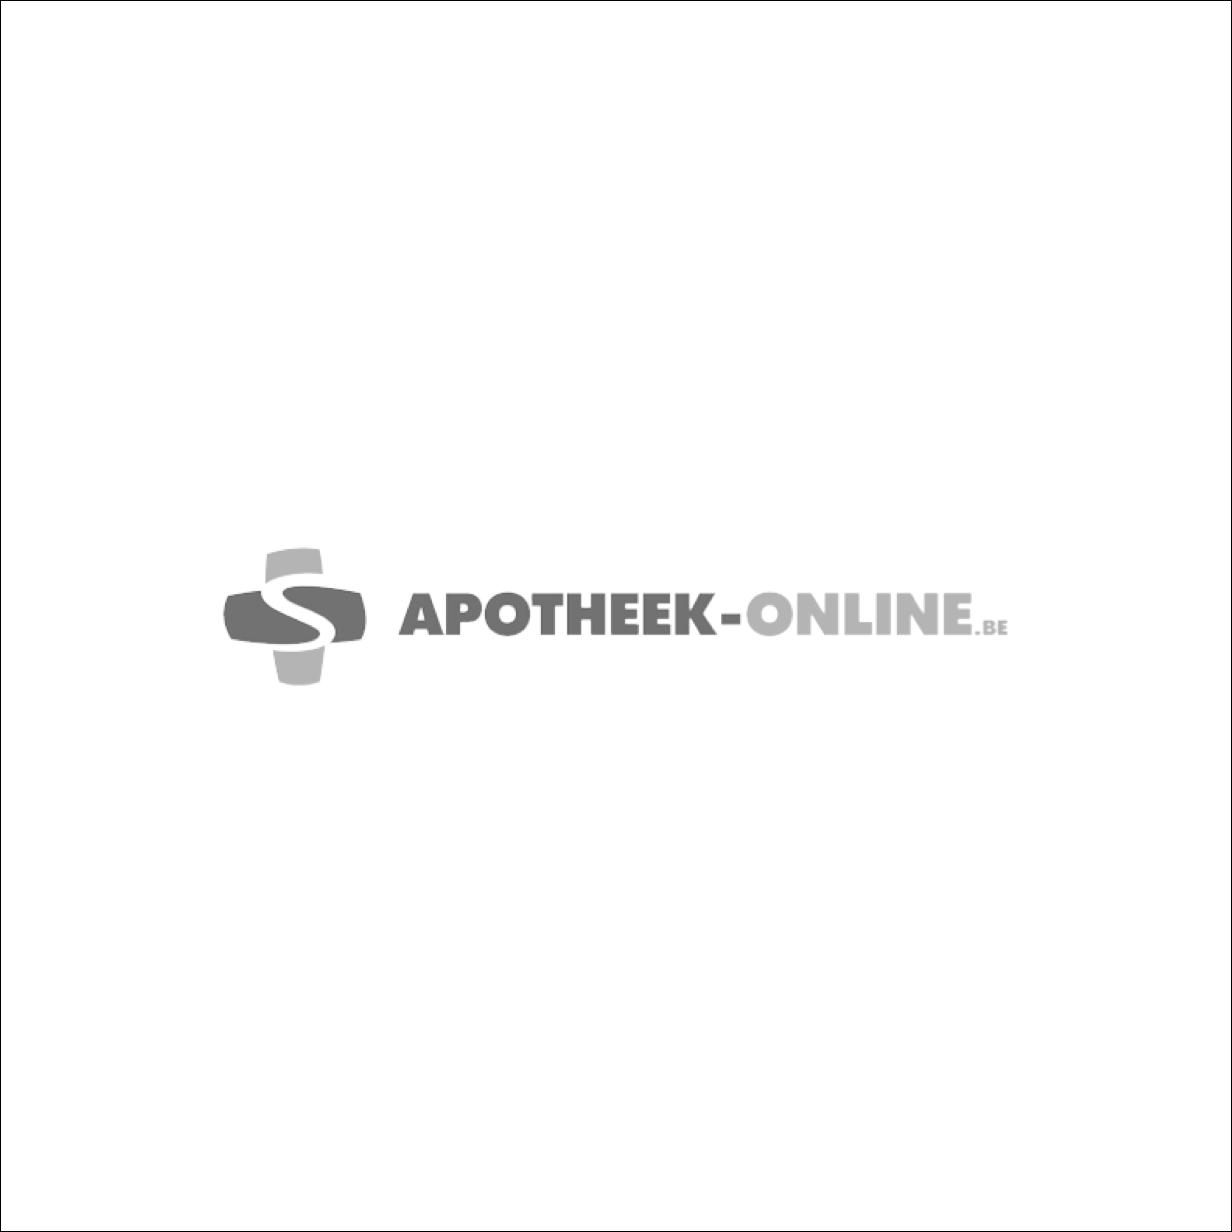 Doils Arthrosis Hond Olie 236ml